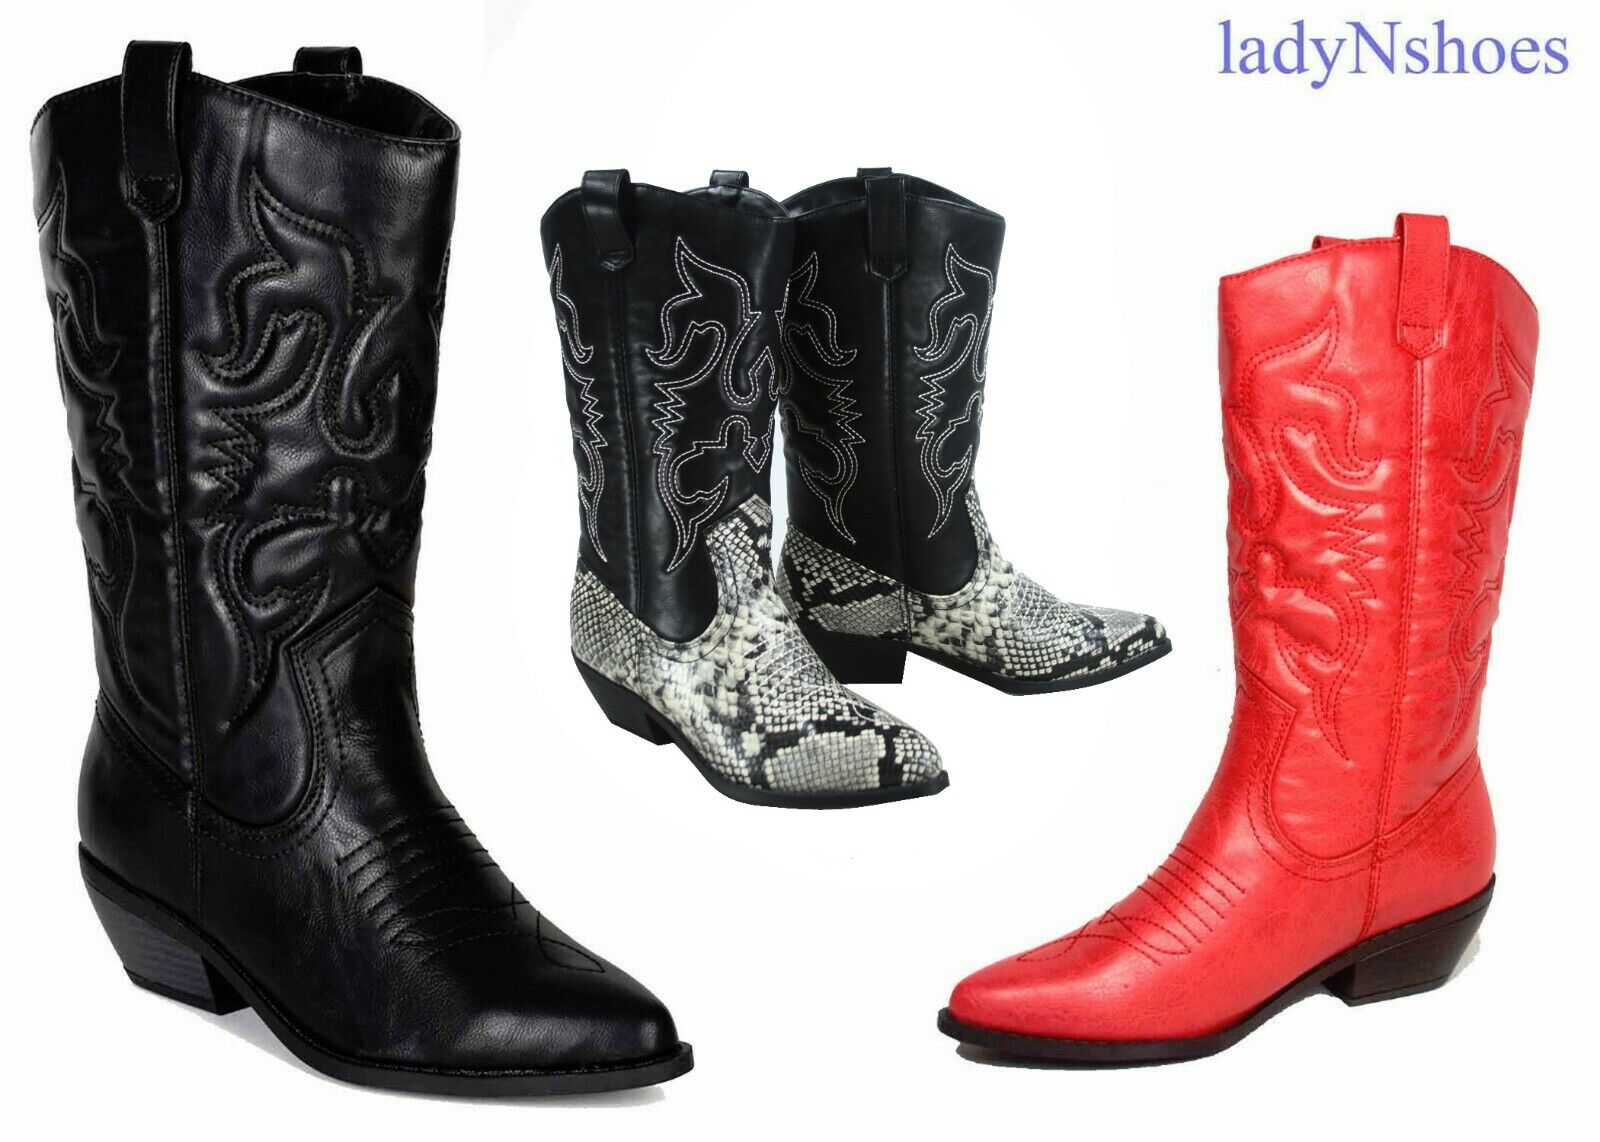 NEW Women's Pointed Toe Cowboy Western Low Heel Mid-Calf Rid